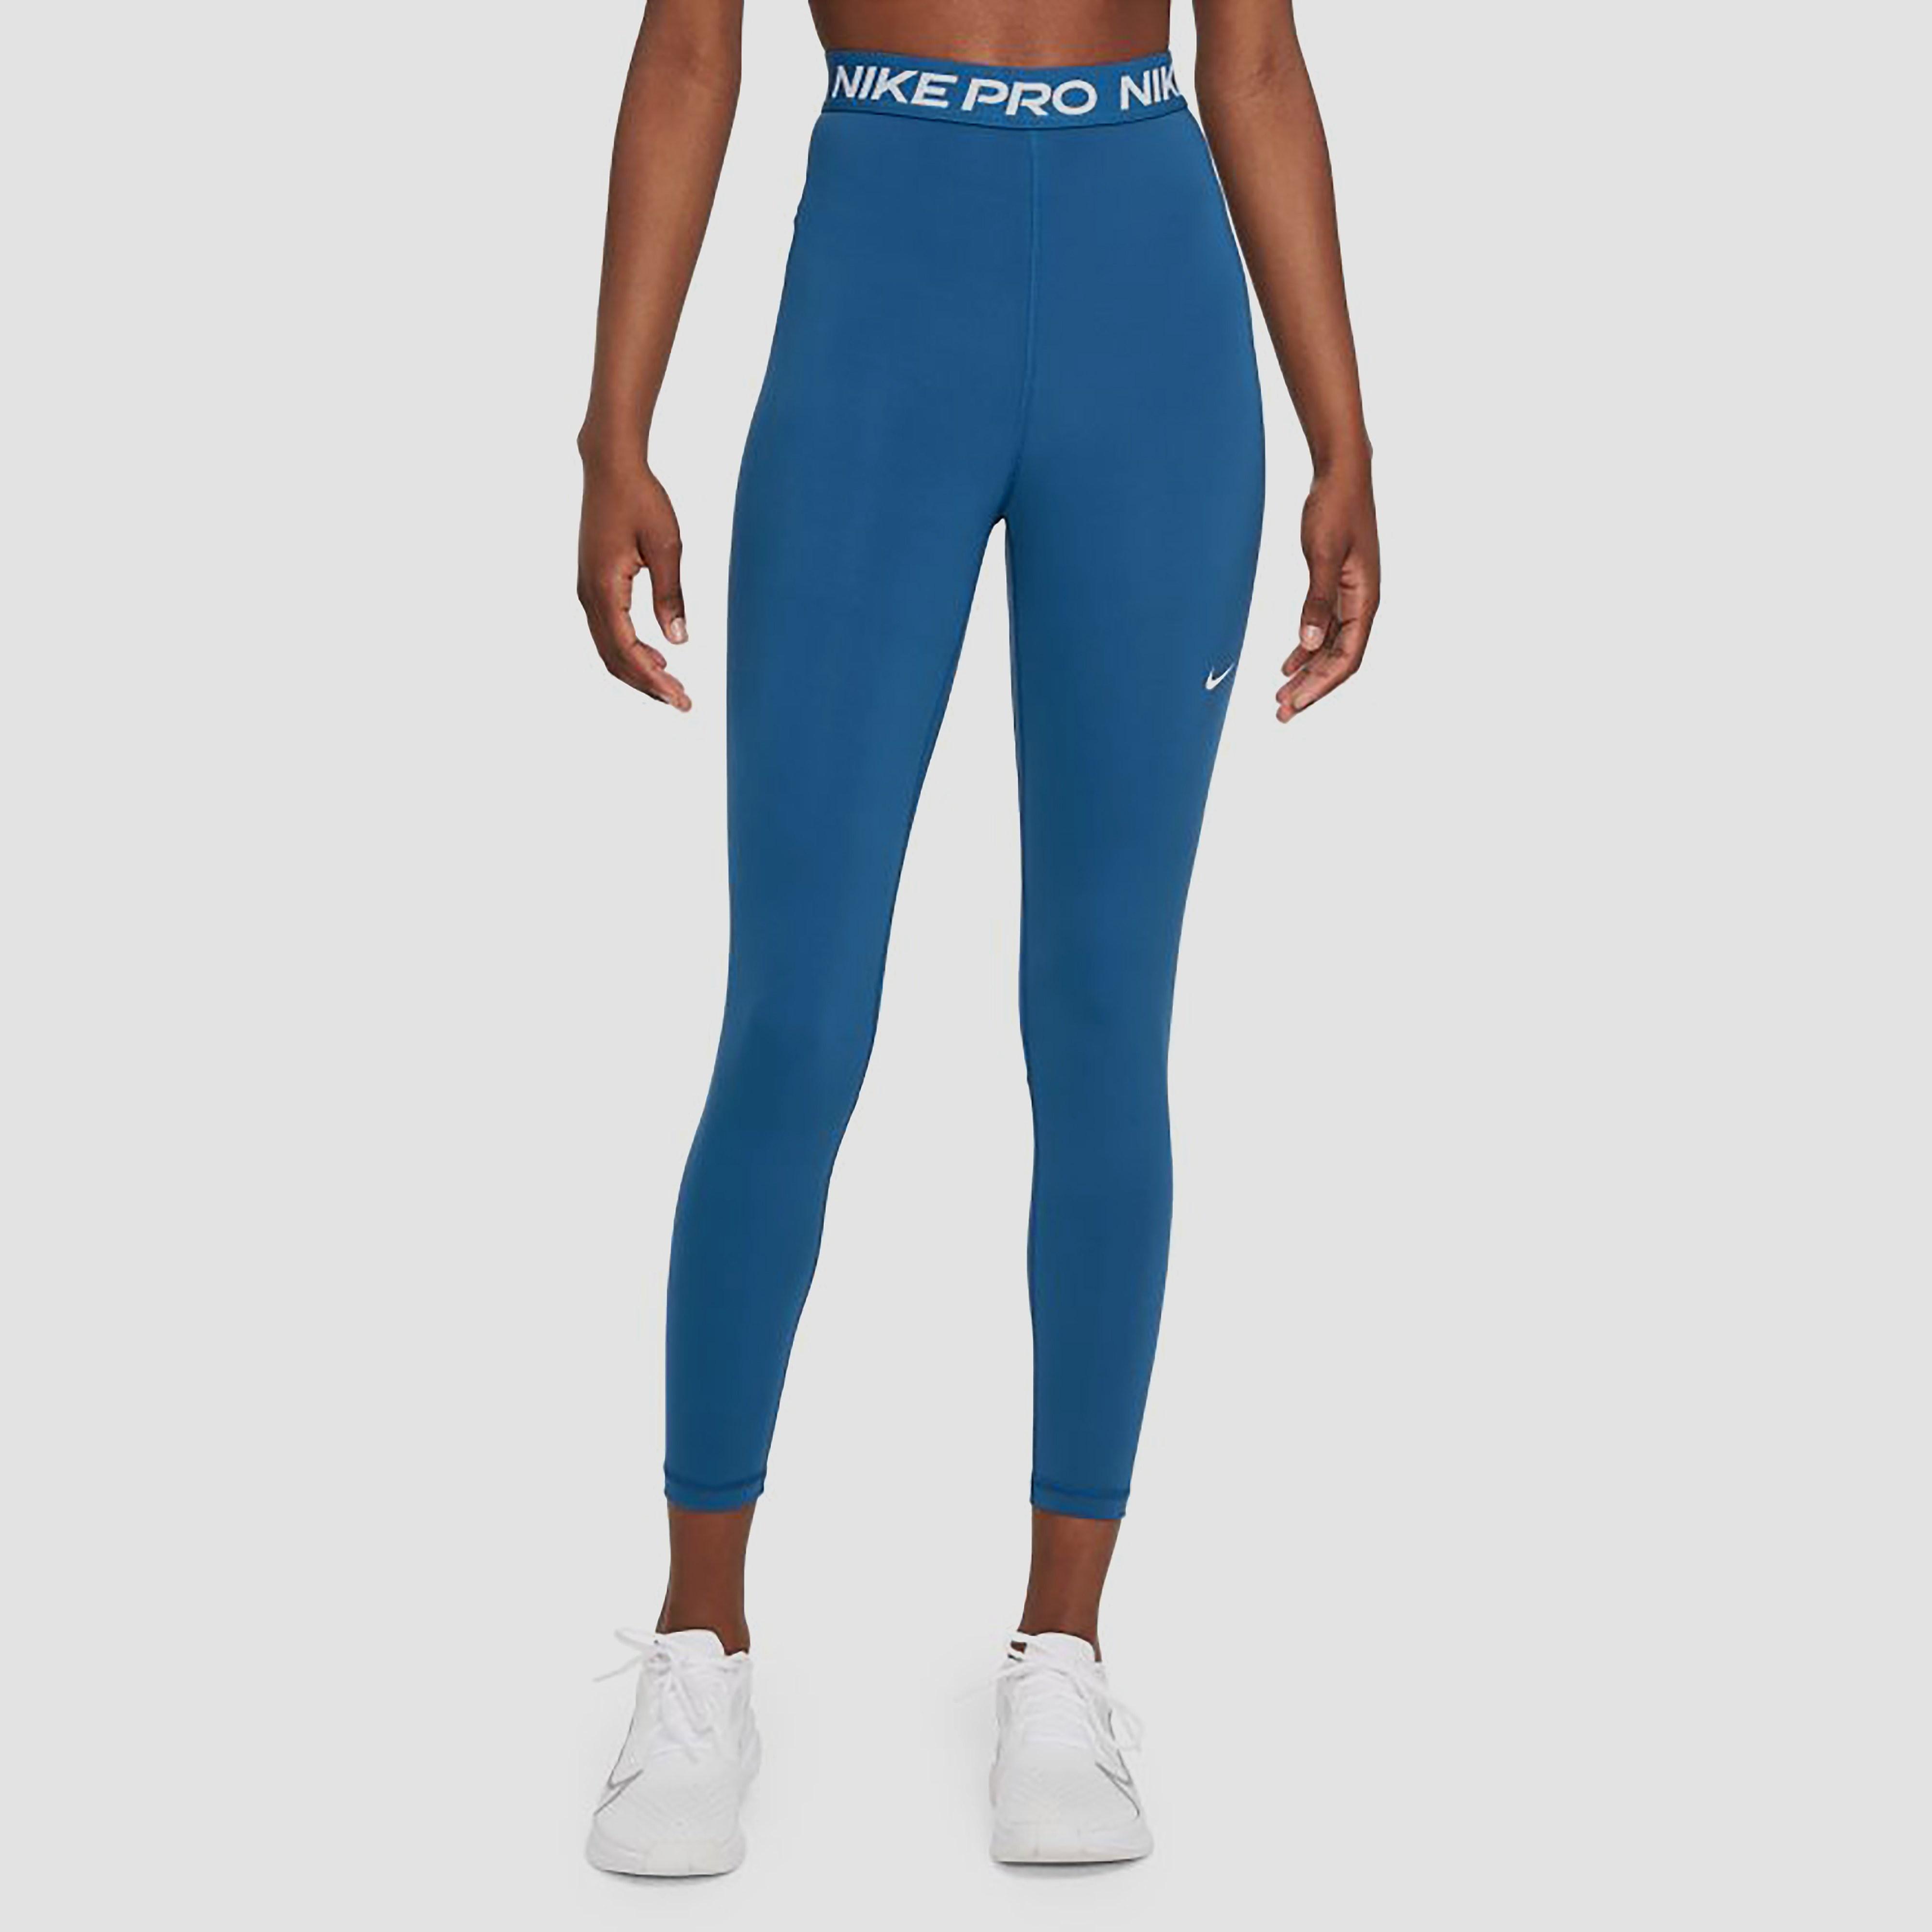 Nike Nike pro 365 high rise 7/8 sporttight blauw dames dames